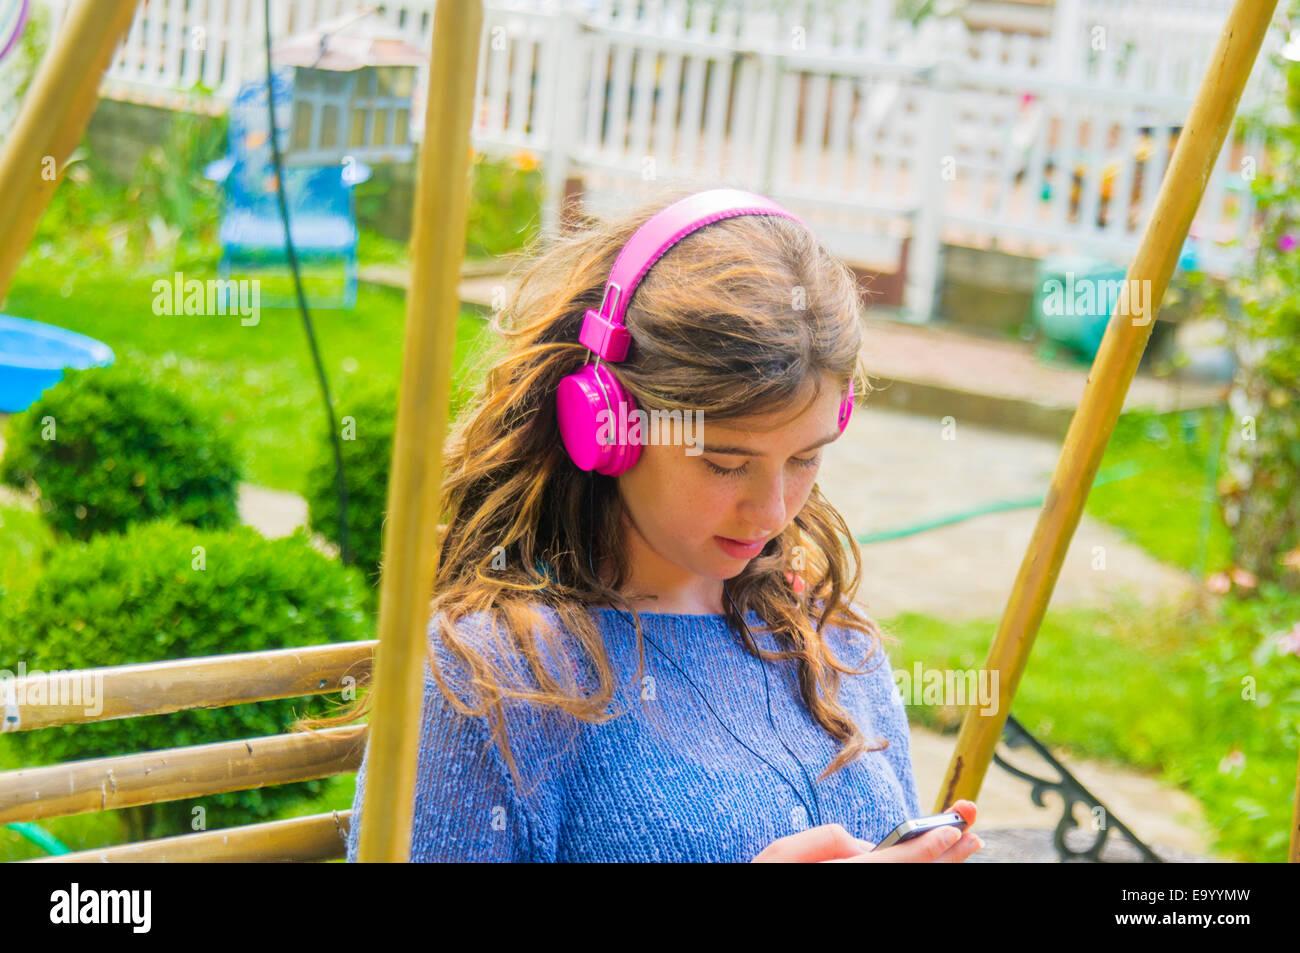 Teenage girl sitting outdoors, wearing headphones Stock Photo